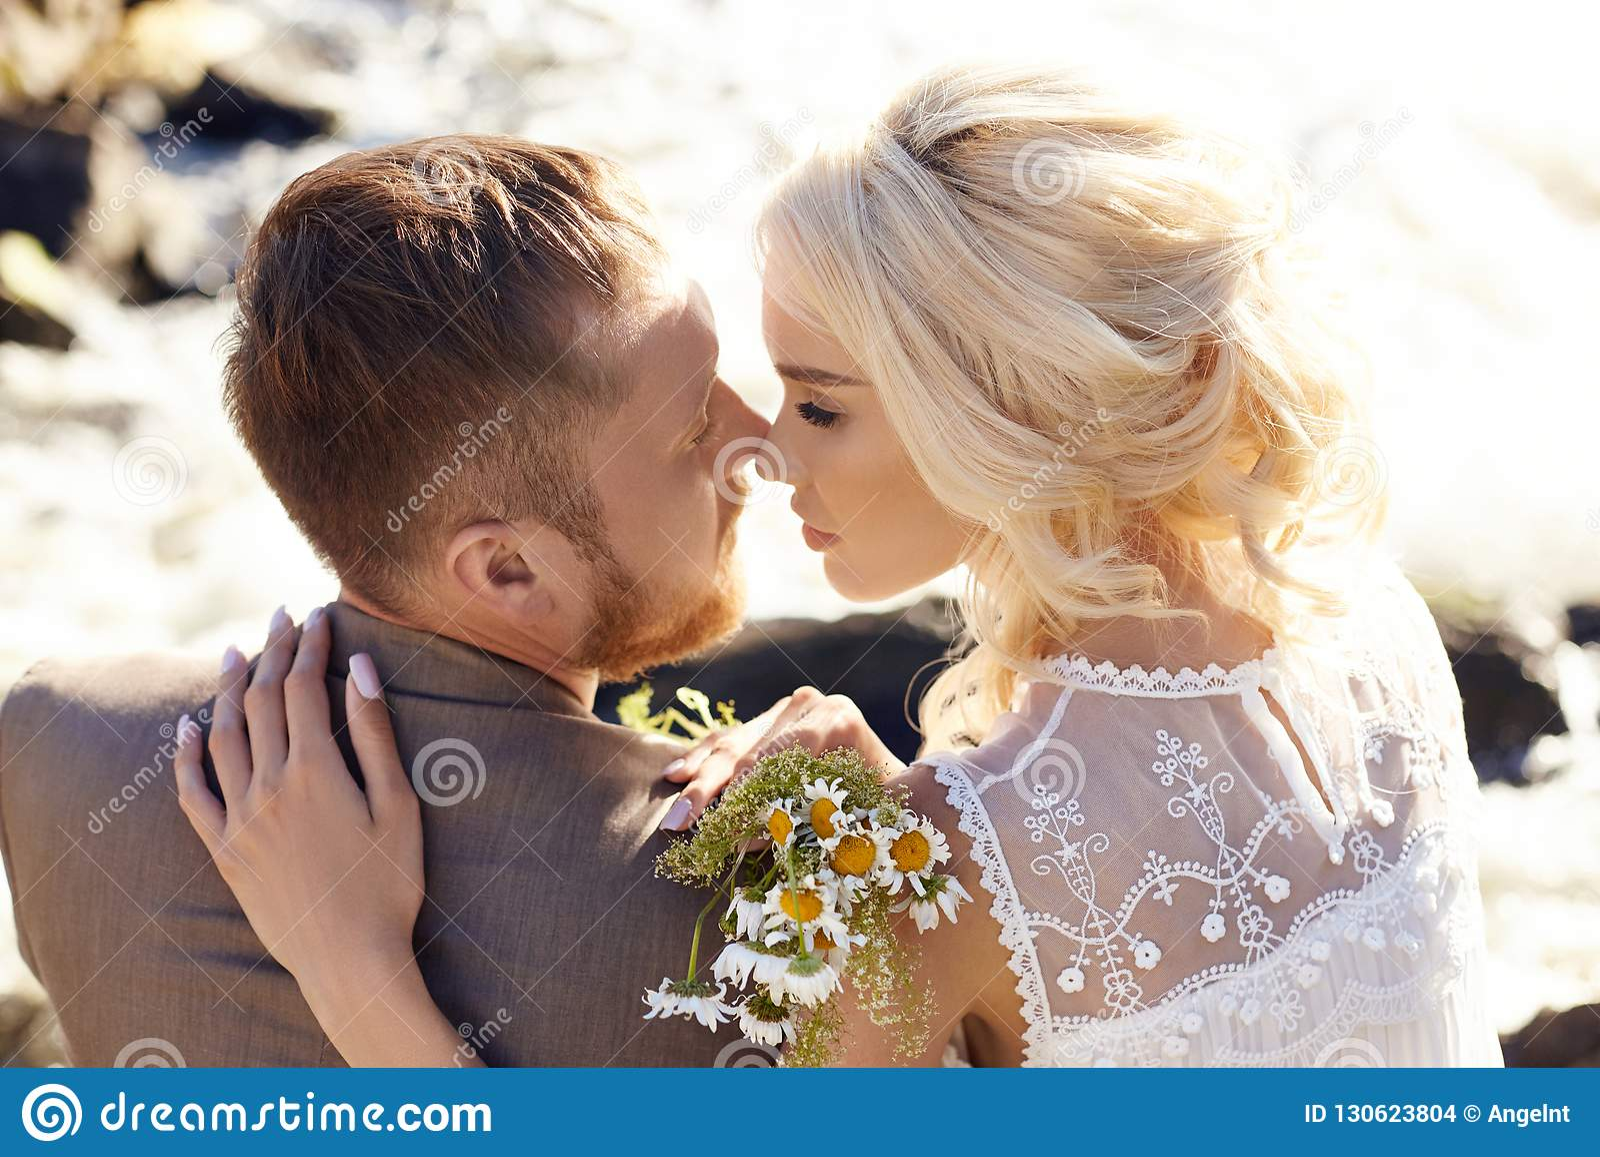 kissing and cuddling